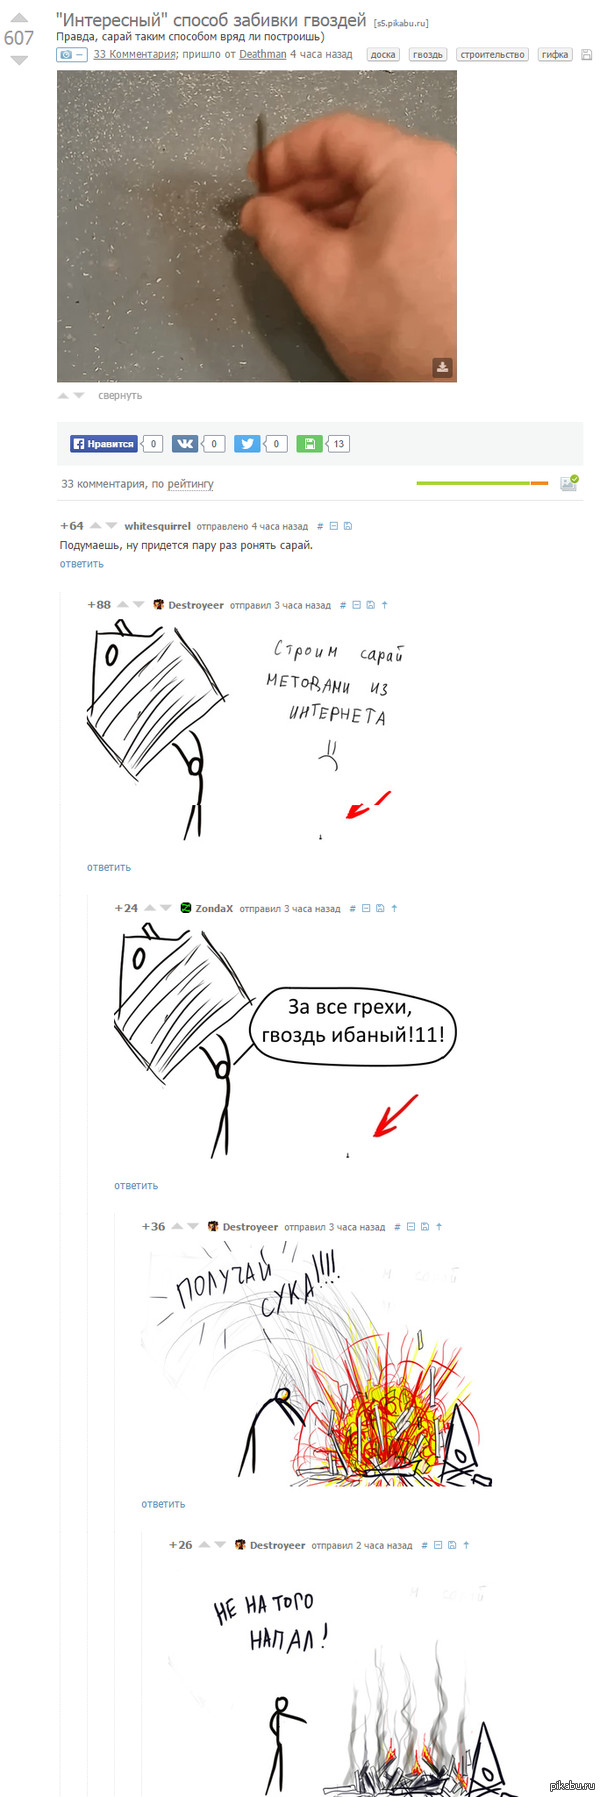 "Комментарии как всегда радуют <a href=""http://pikabu.ru/story/quotinteresnyiyquot_sposob_zabivki_gvozdey_3252799"">http://pikabu.ru/story/_3252799</a>"